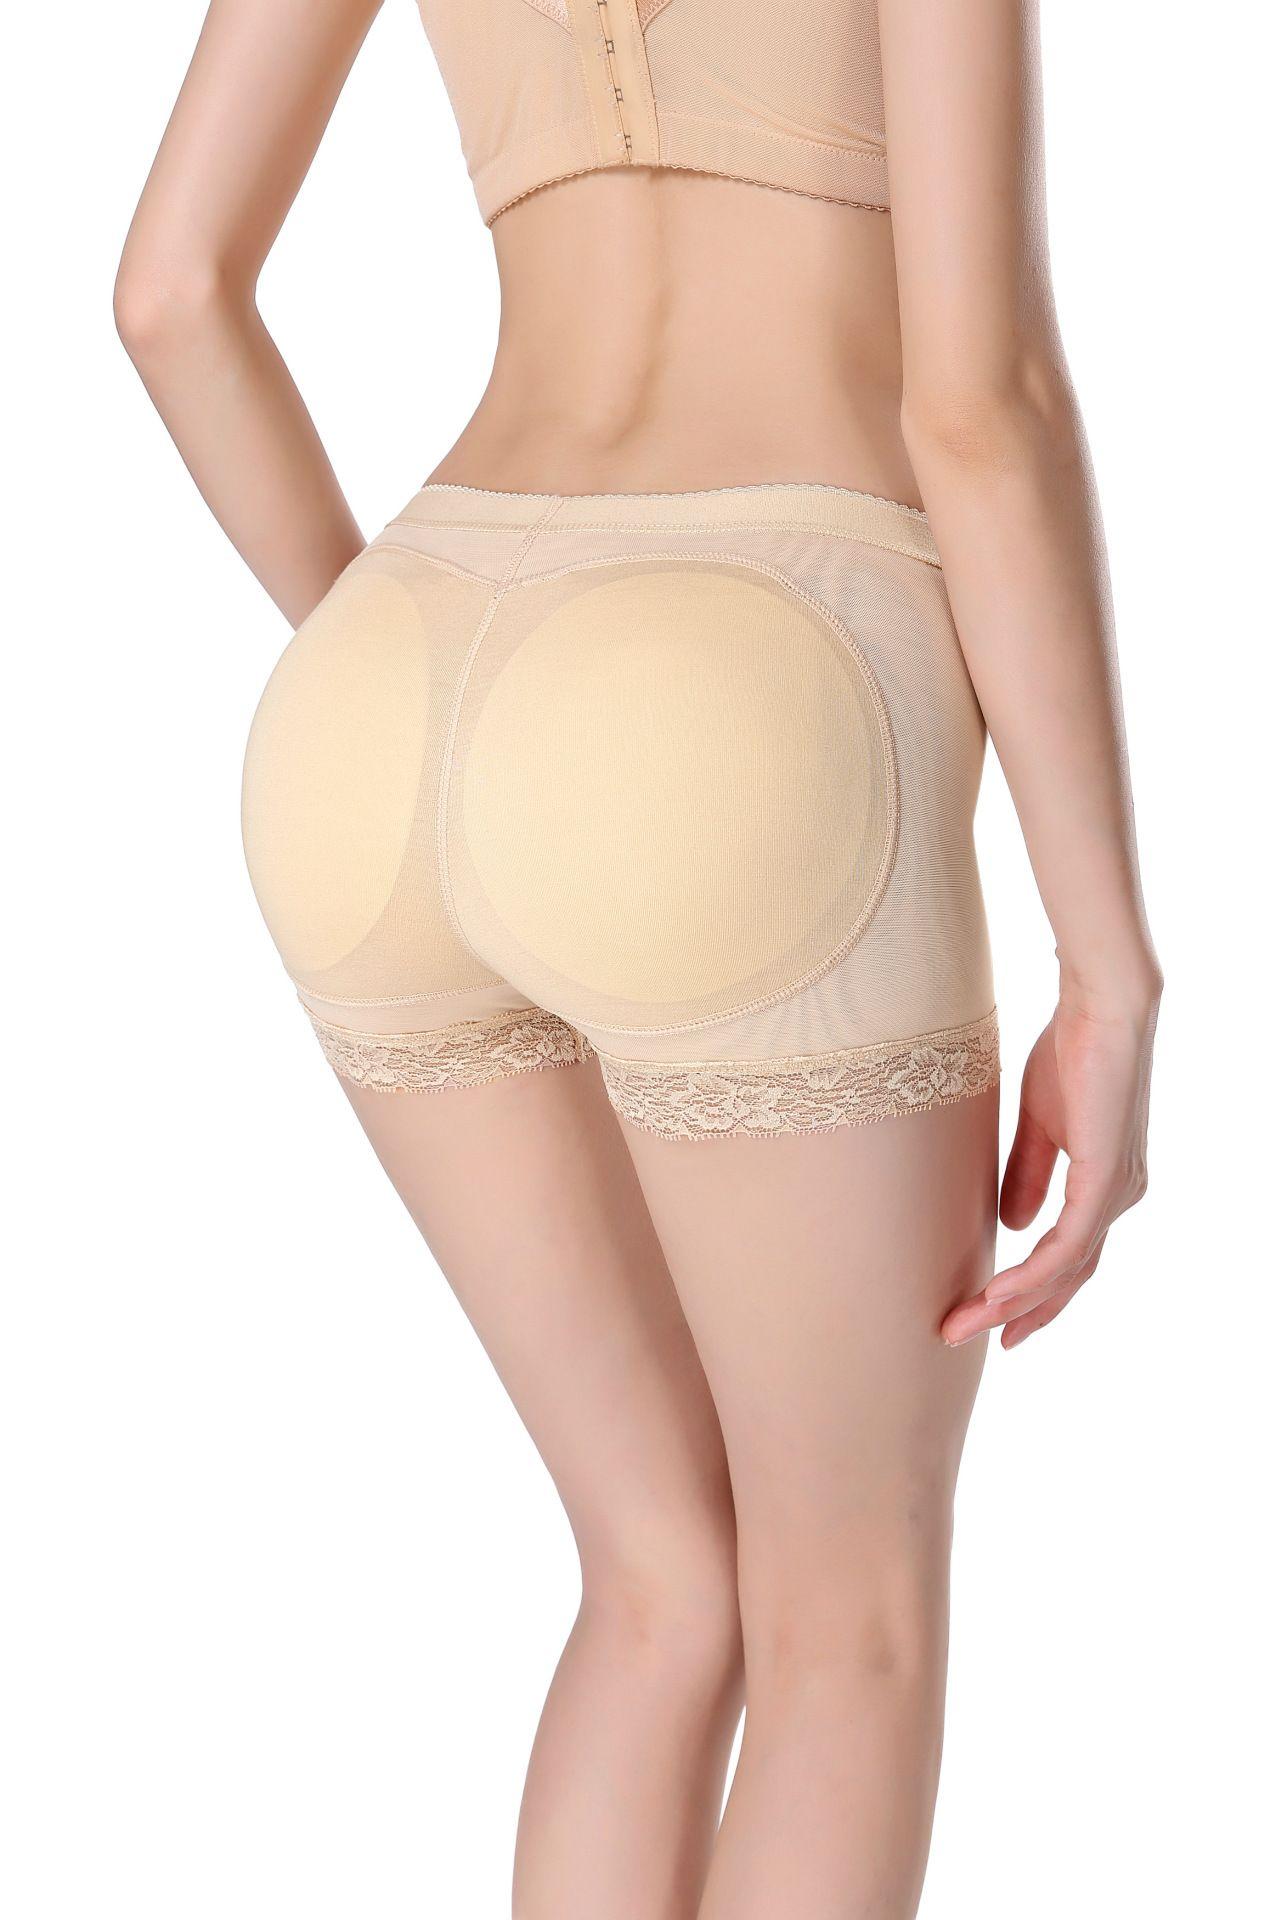 cb0aee825 2019 Women Sexy Body Shapers 2018 Summer Sexy Solid Short Butt Lifter Shaper  Panties Shapewear Butt Lift Control Boyshorts Free DHL Shipping From ...